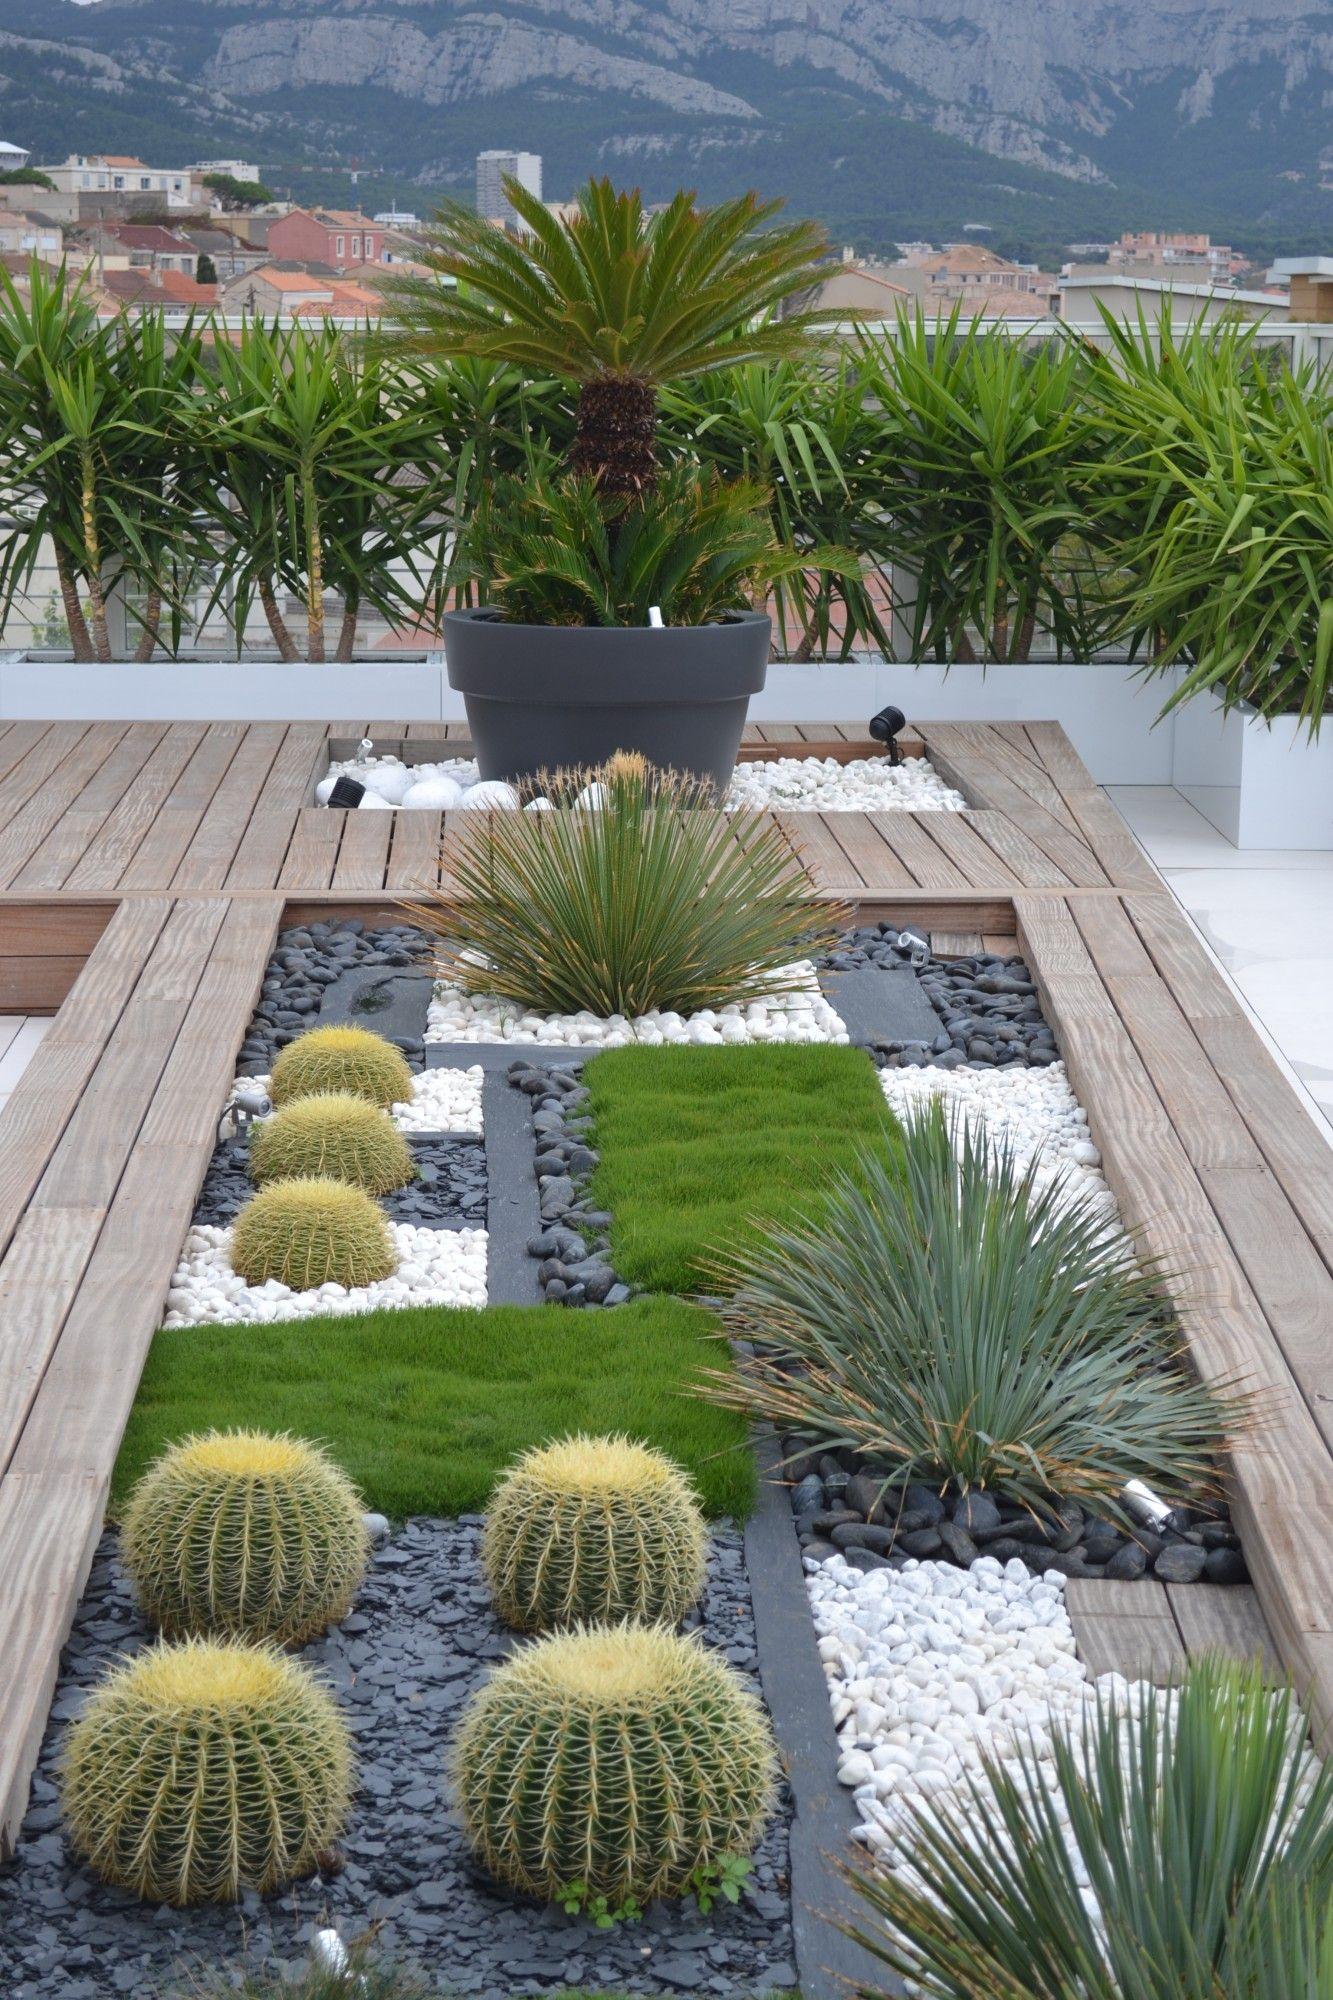 Marseille - N. Roubaud - Vert Tige | Kafi | Jardins ... encequiconcerne Idee Amenagement Jardin Zen